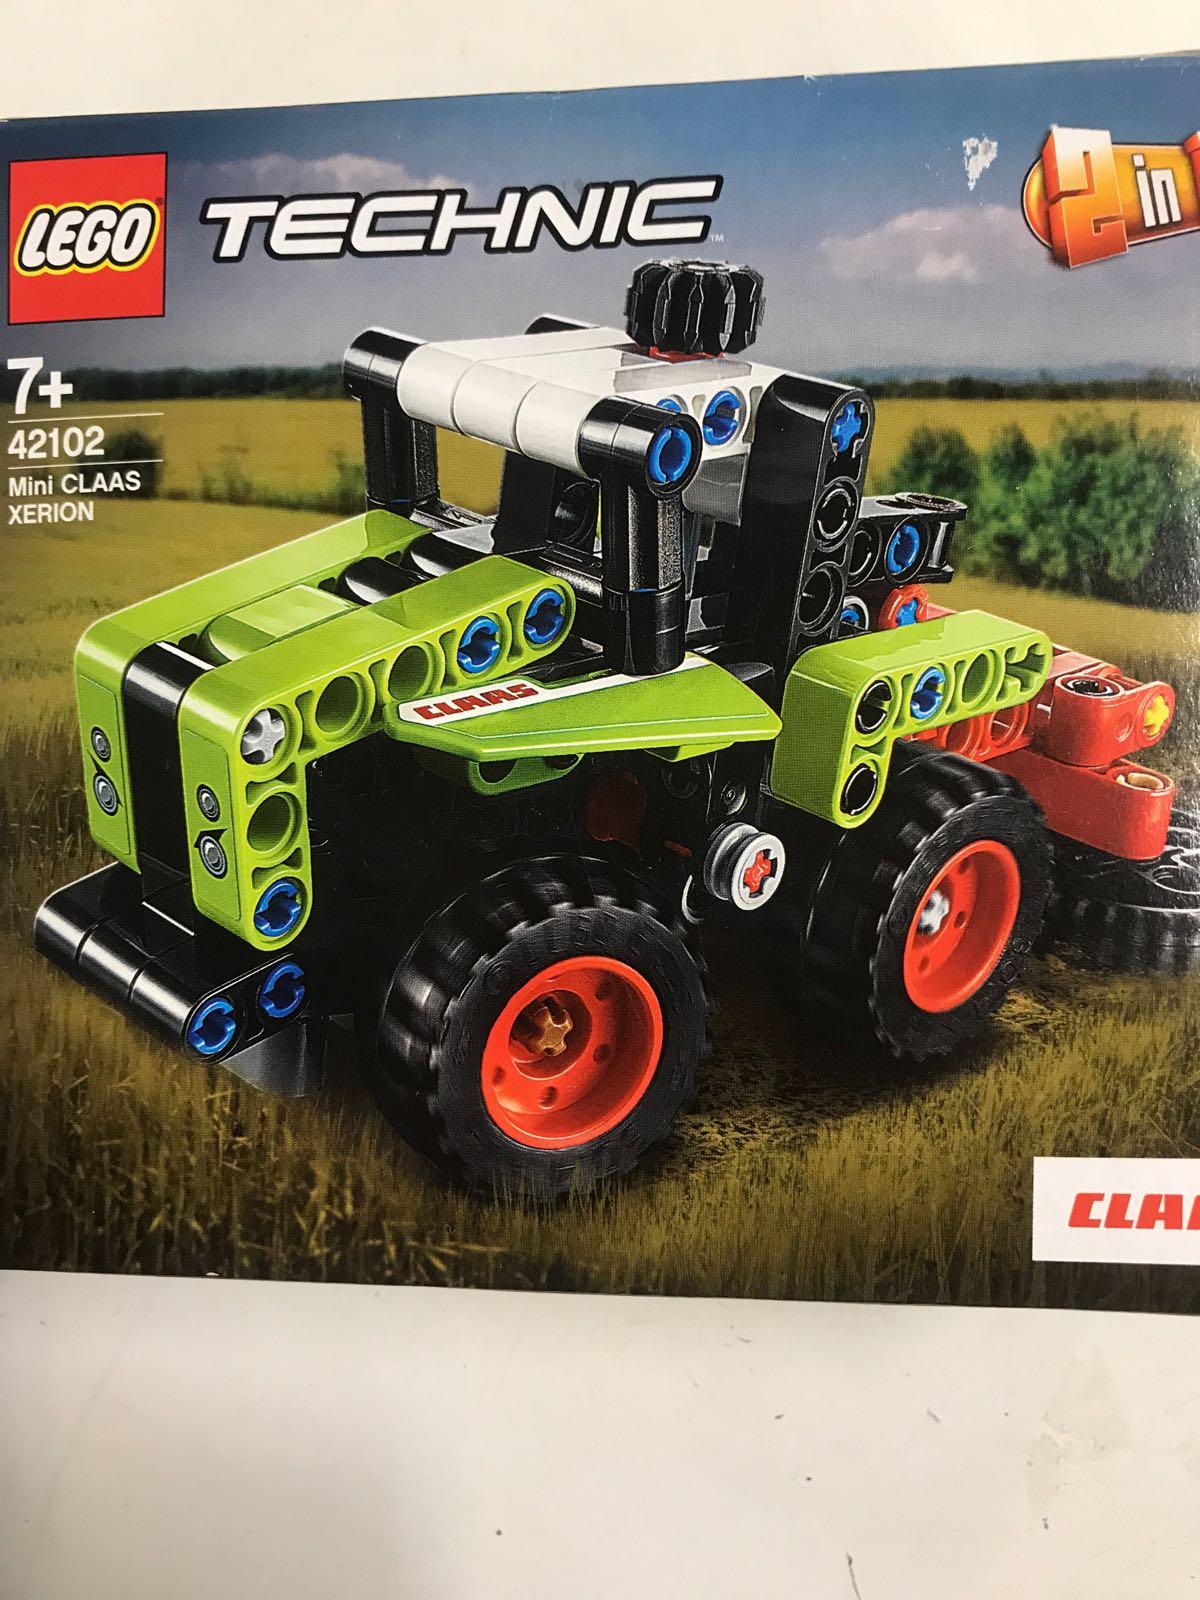 Lego Technic 7+